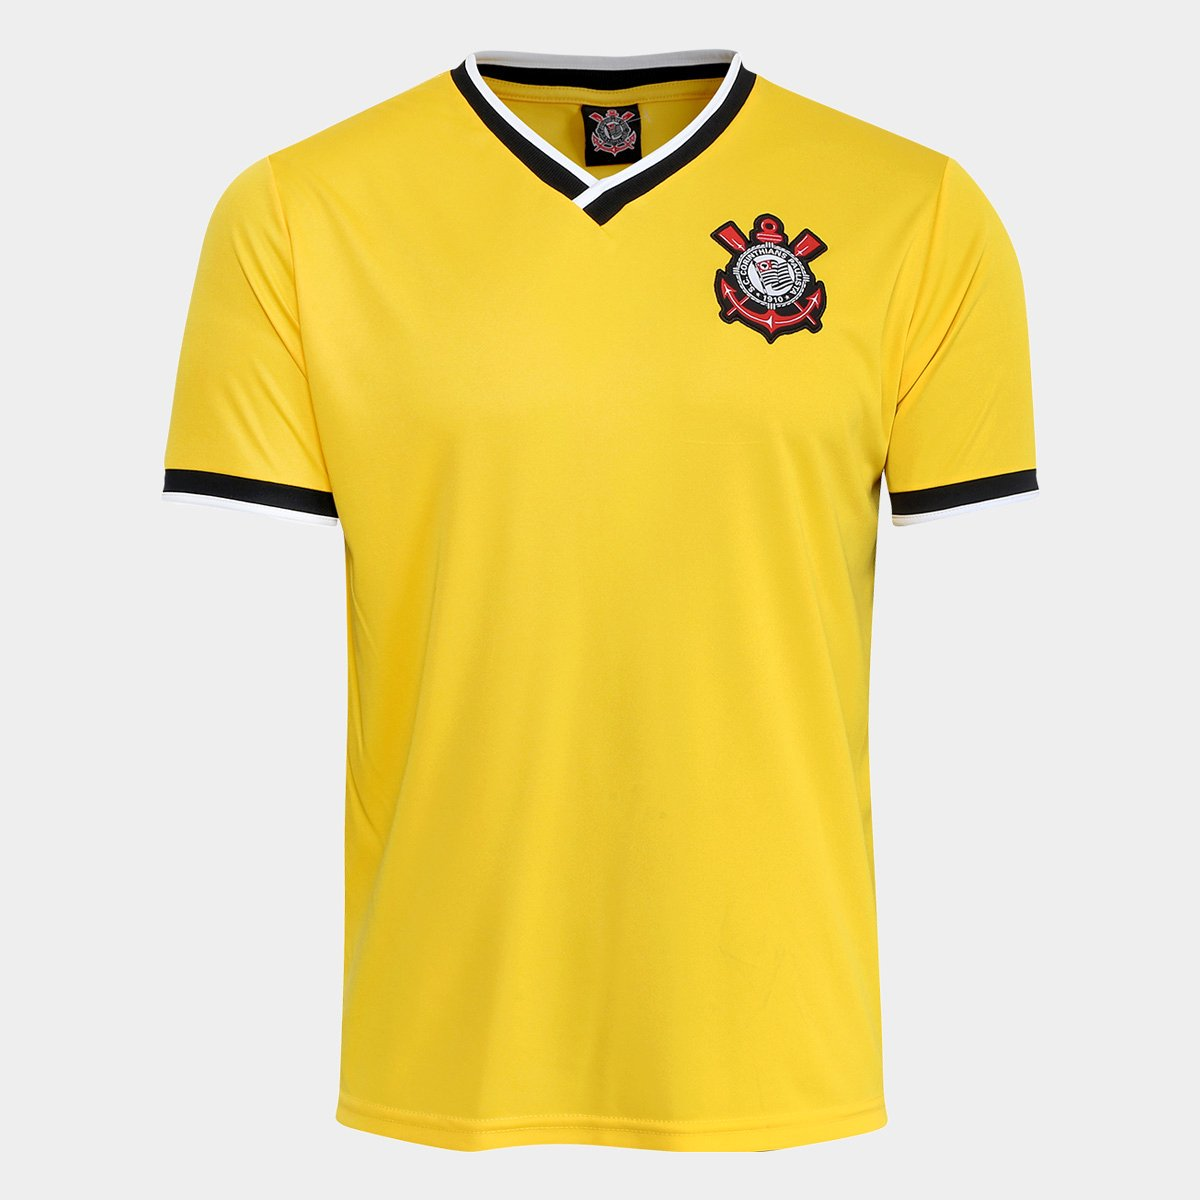 4aeb1aa7a3ecf Camisa Corinthians 2014 n° 10 Edição limitada Masculina - Amarelo ...